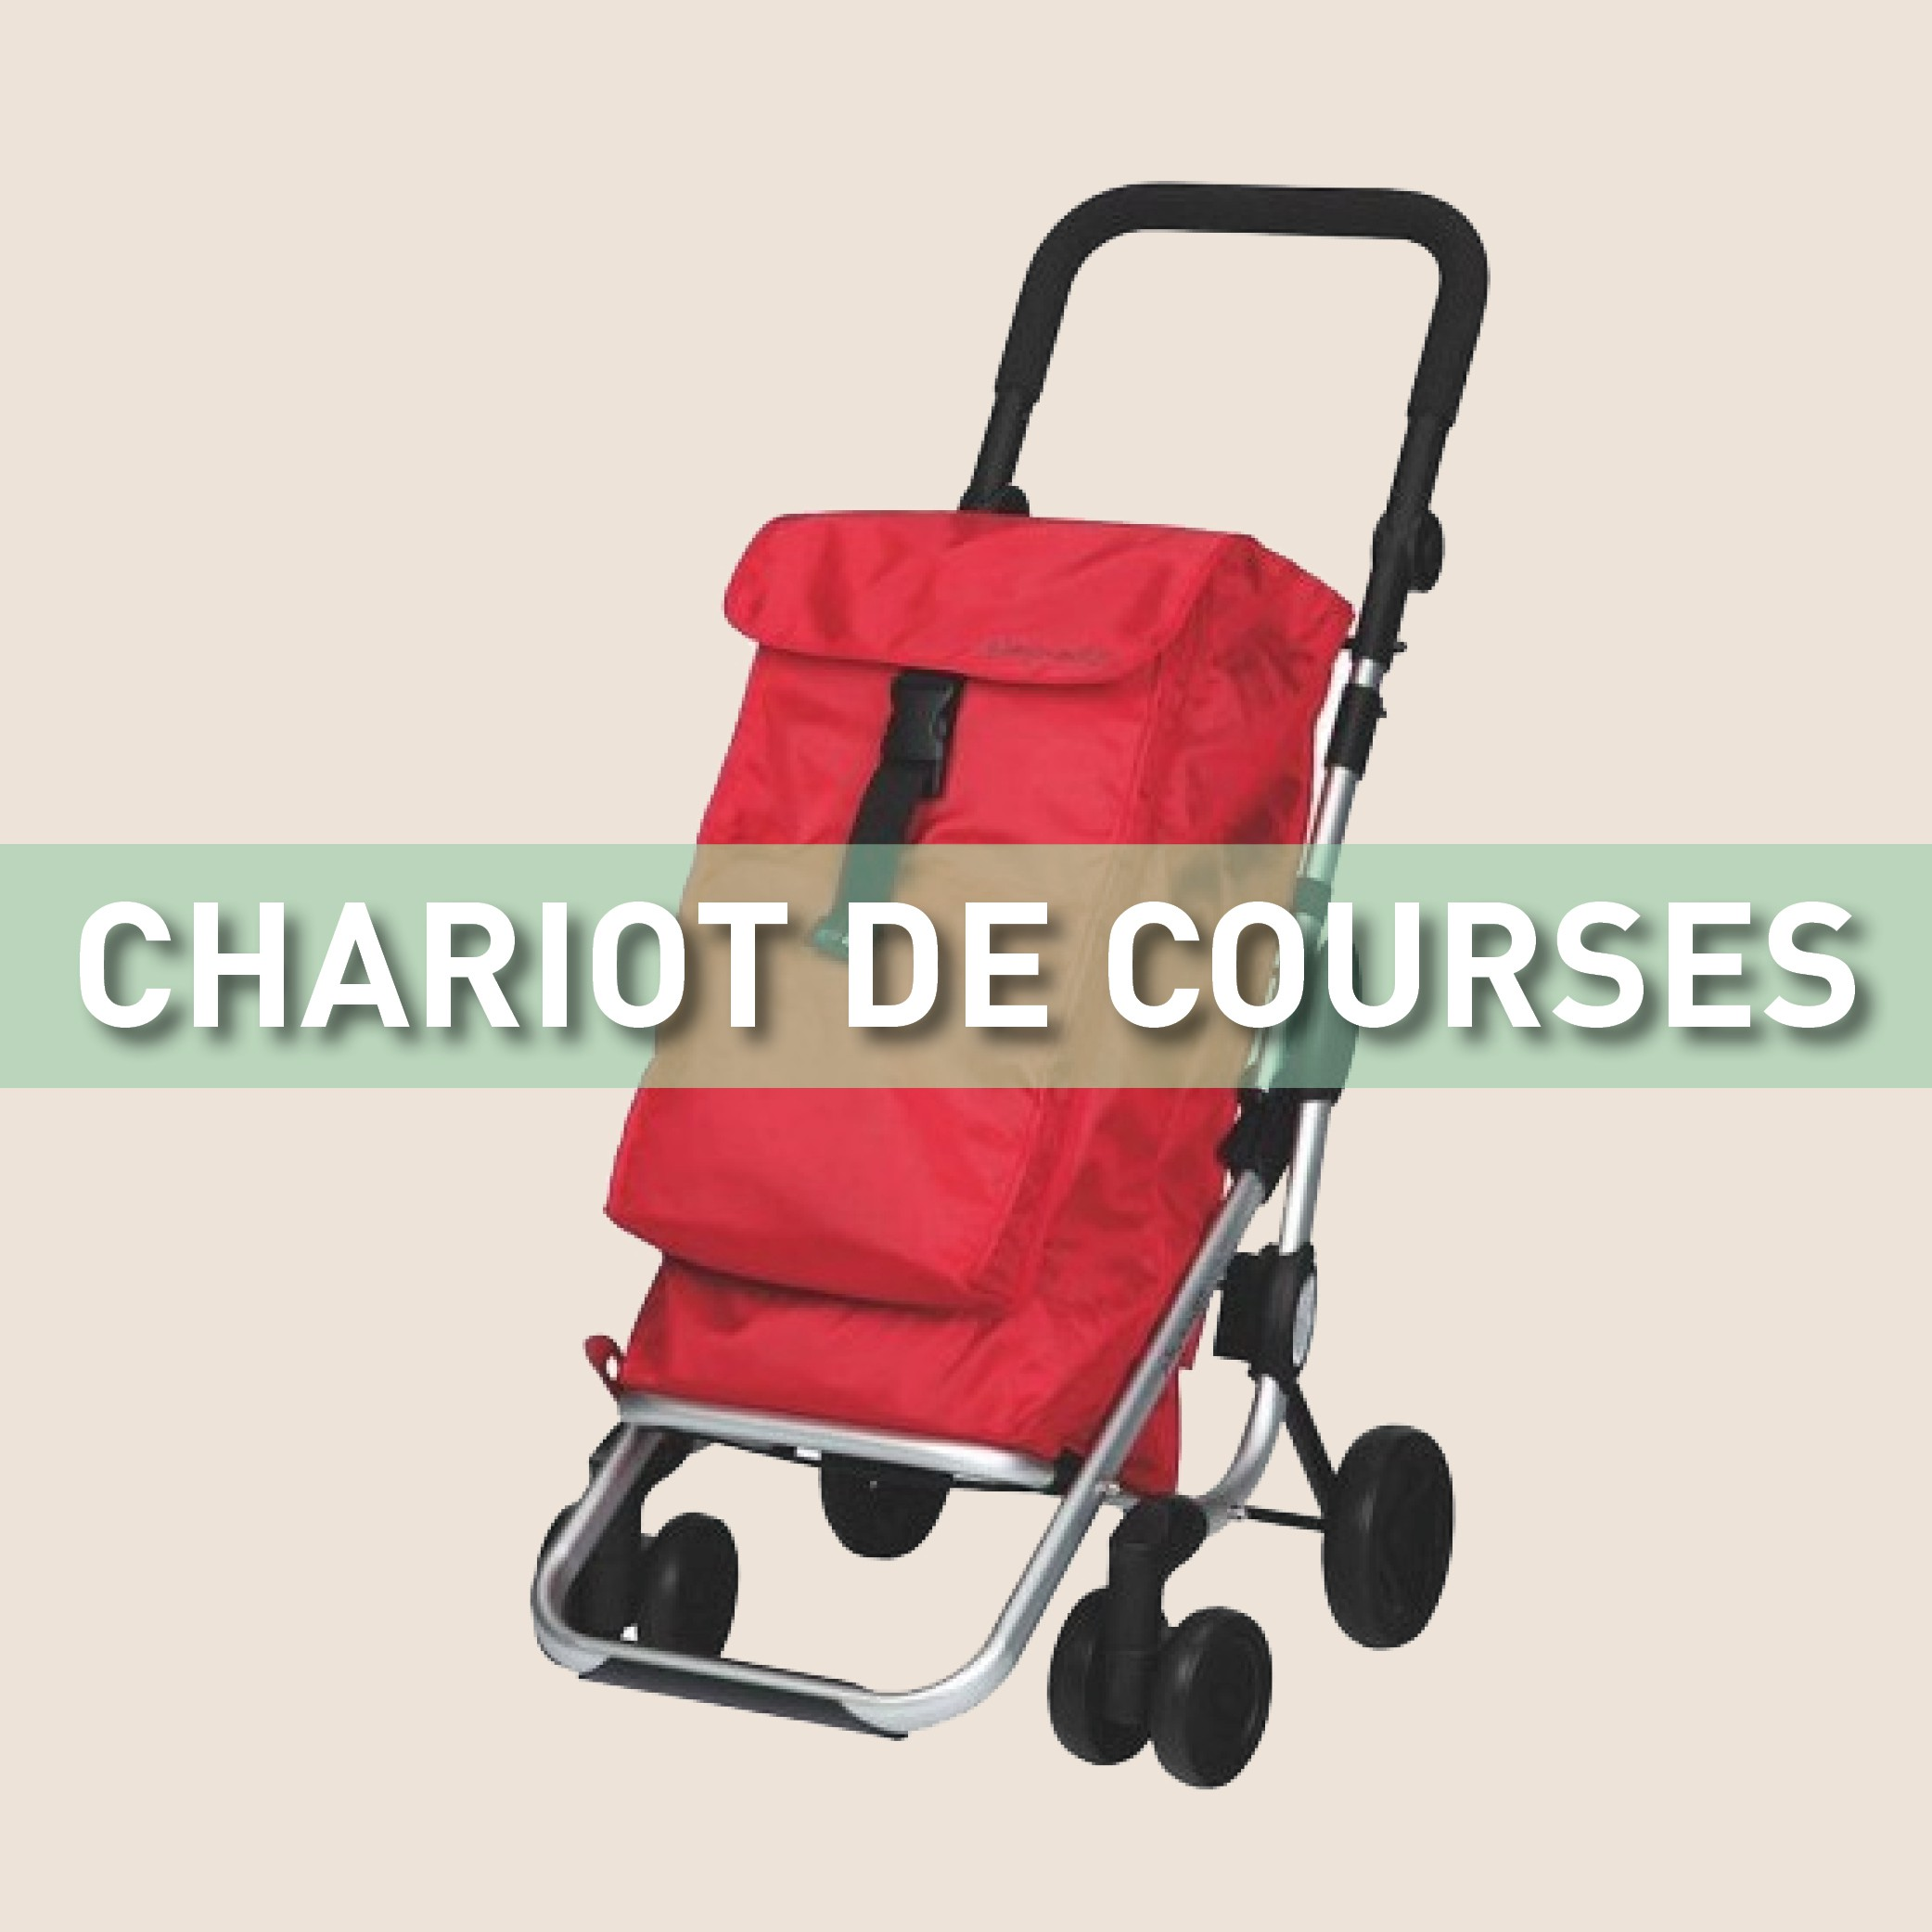 Chariot de courses